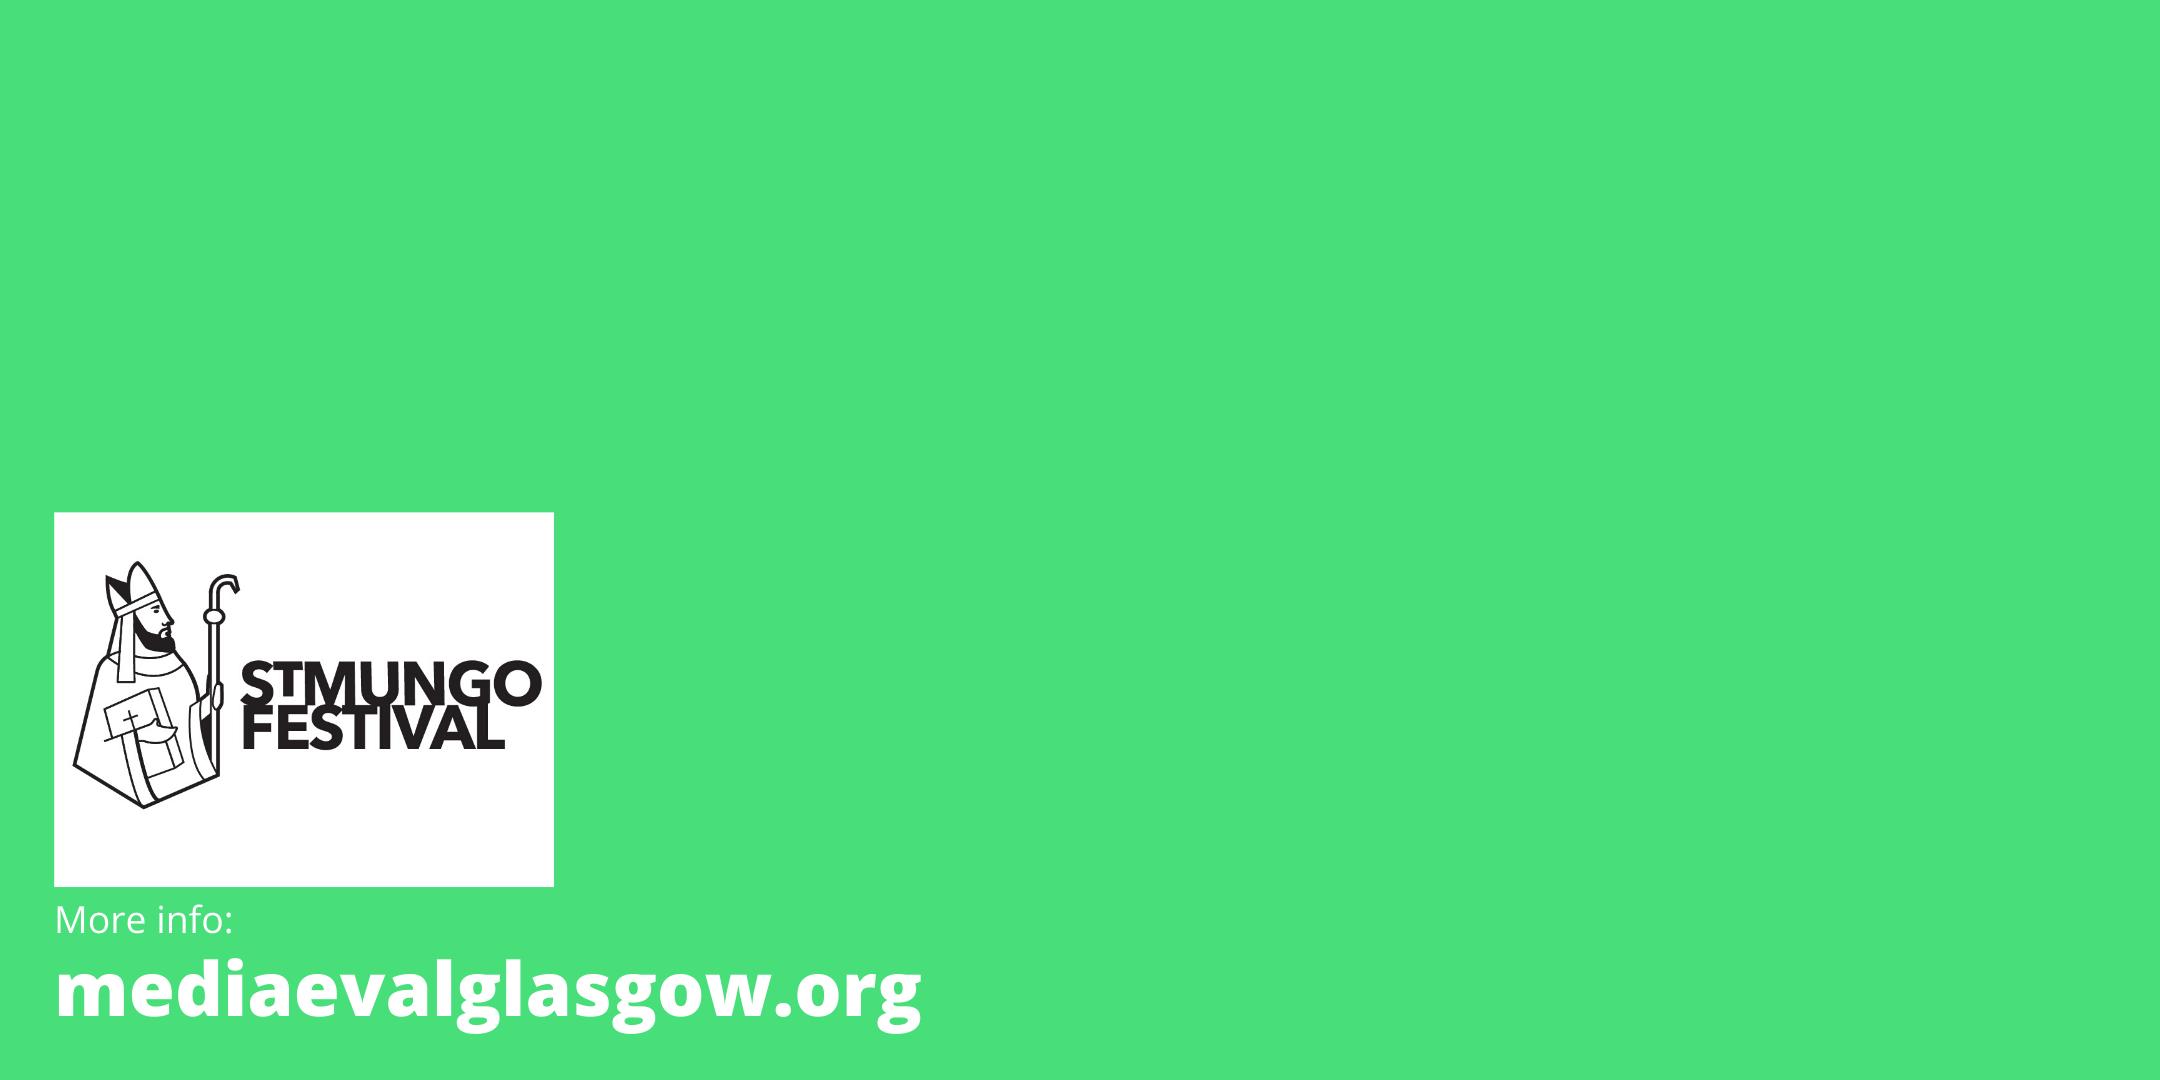 St Mungo 2020 - Glasgow Walking Lunch